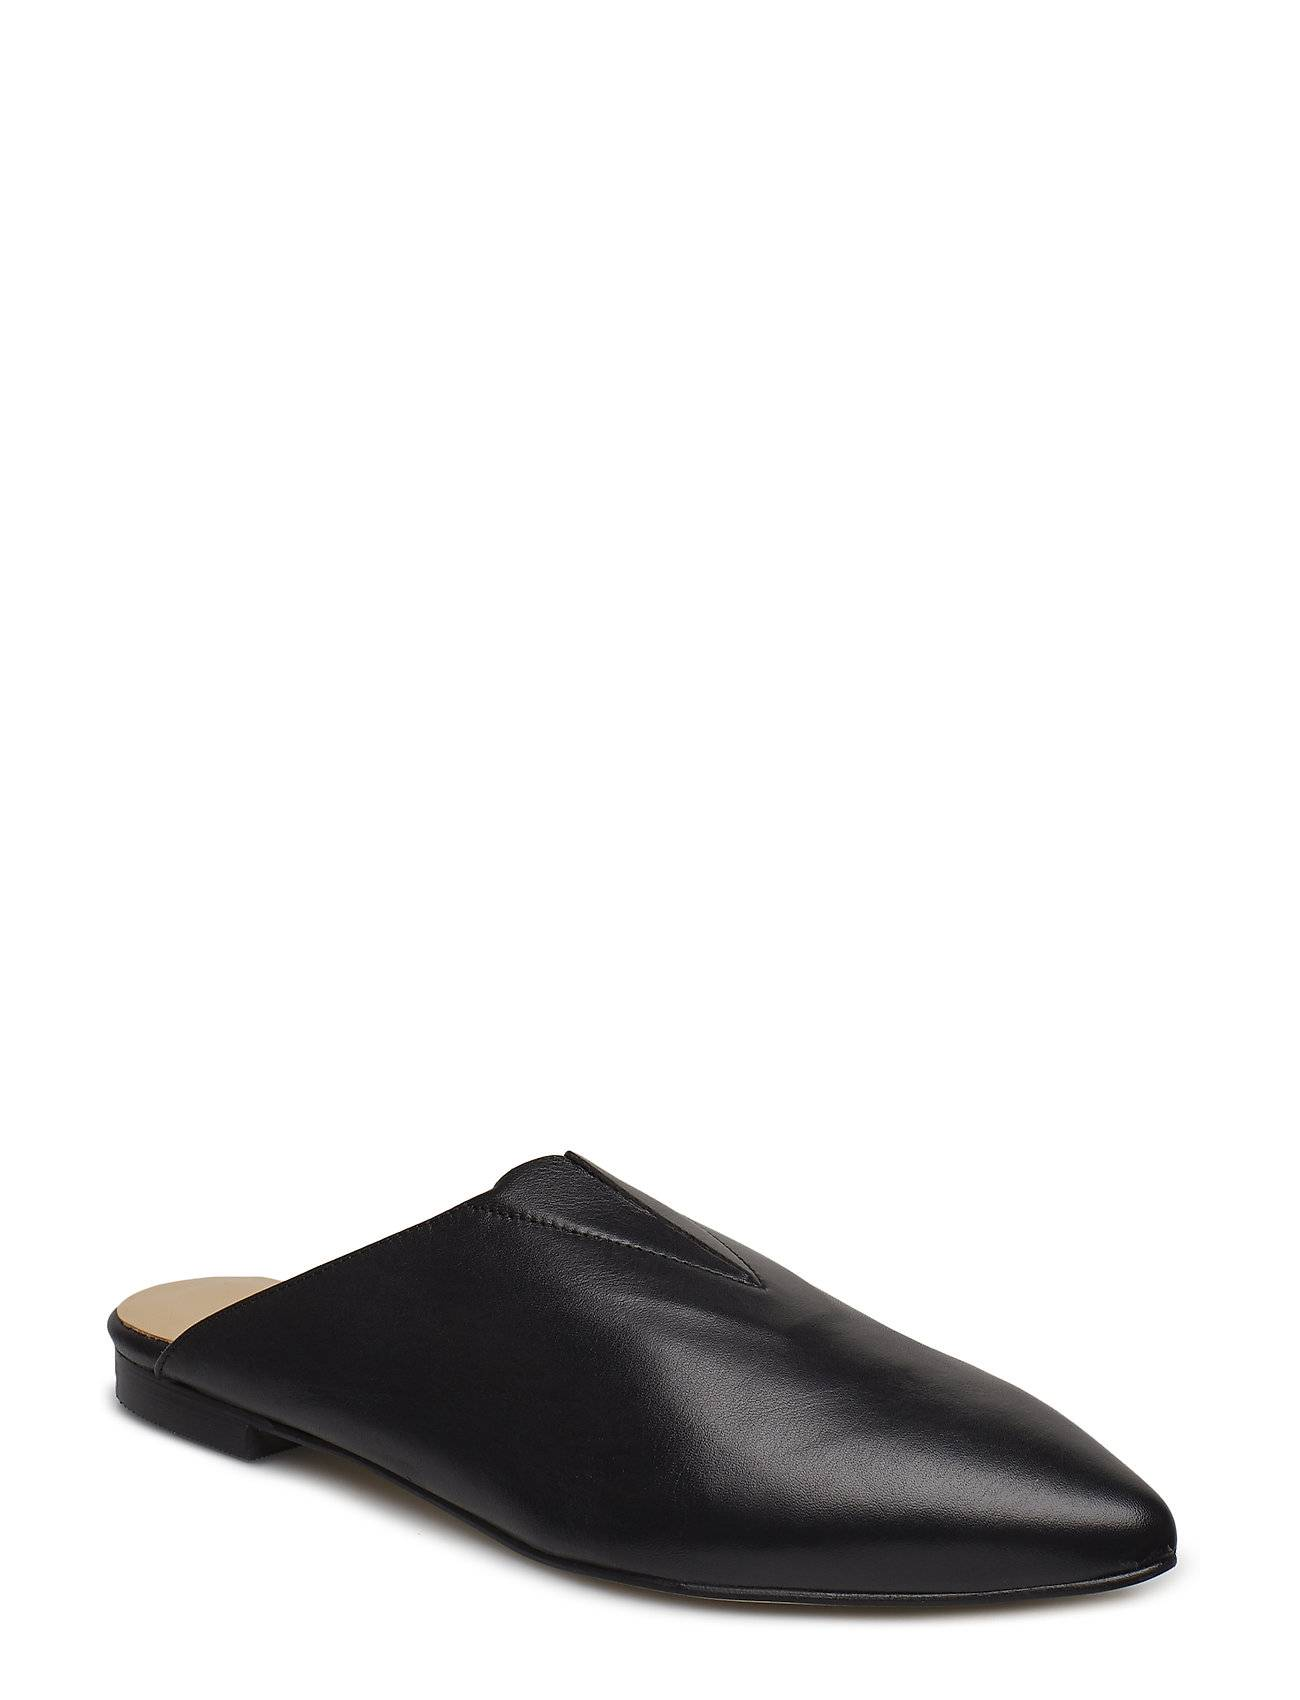 Henry Kole Alek Leather Black Matalapohjaiset Sandaalit Musta Henry Kole